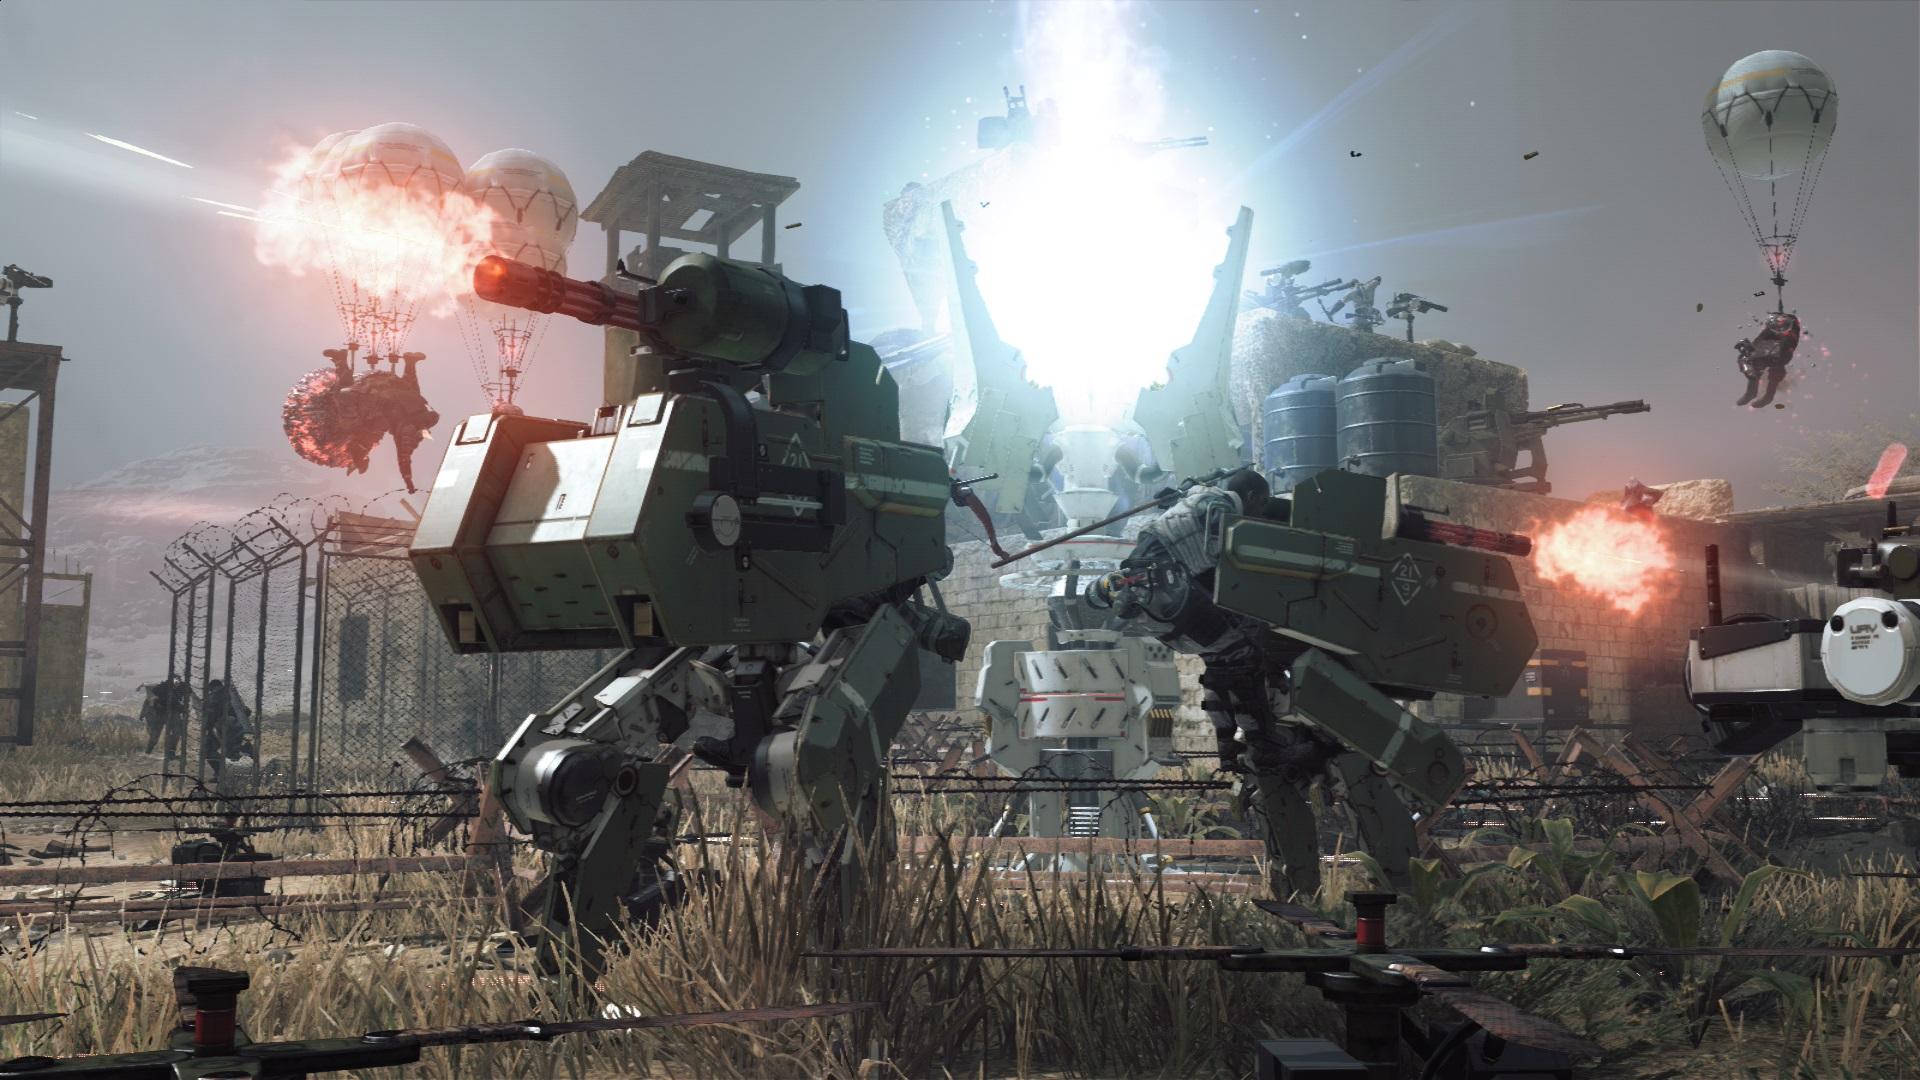 Hands-on with Metal Gear Survive was a bummer screenshot